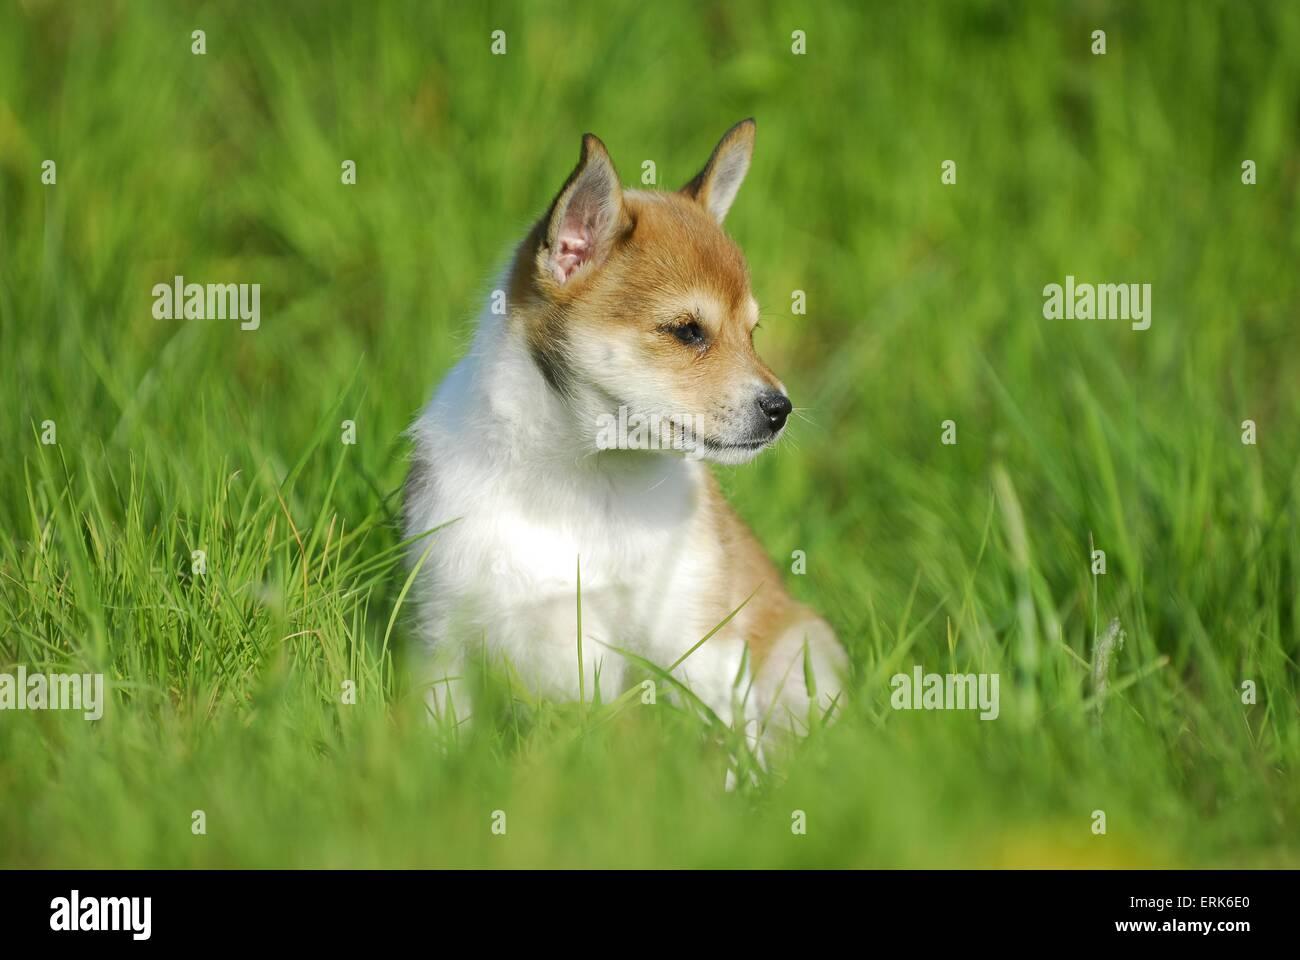 Norwegian Lundehund Puppy Stock Photo 83400744 Alamy